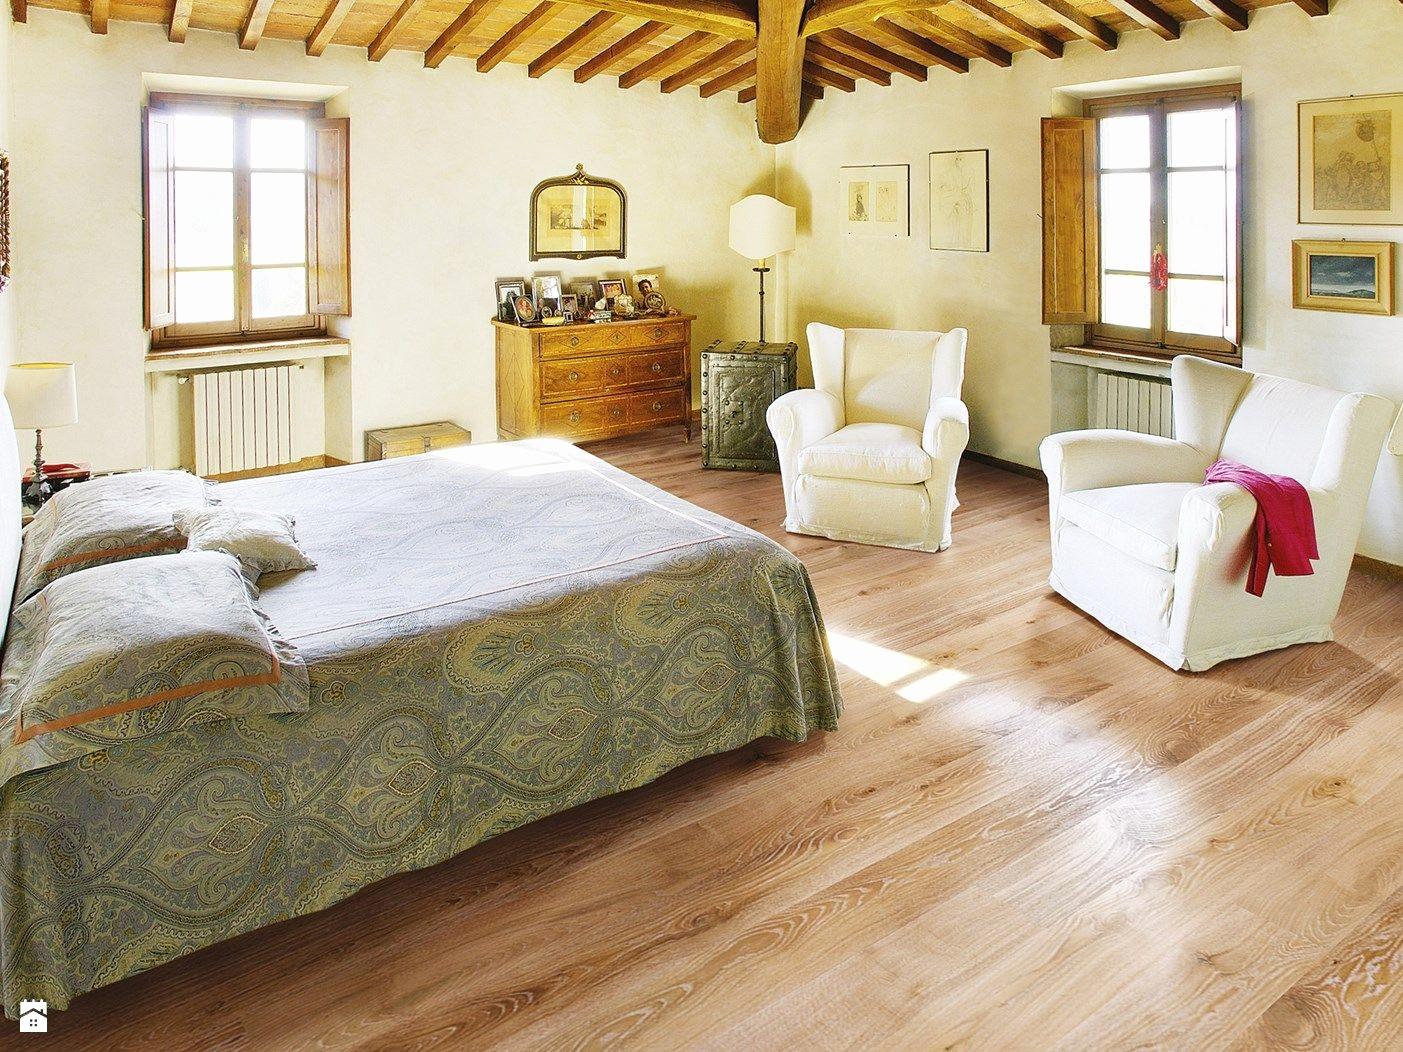 "engineered hardwood flooring vs hardwood flooring of white engineered hardwood flooring awesome sypialnia styl rustykalny for white engineered hardwood flooring awesome sypialnia styl rustykalny zdja""a""¢cie od barlinek"